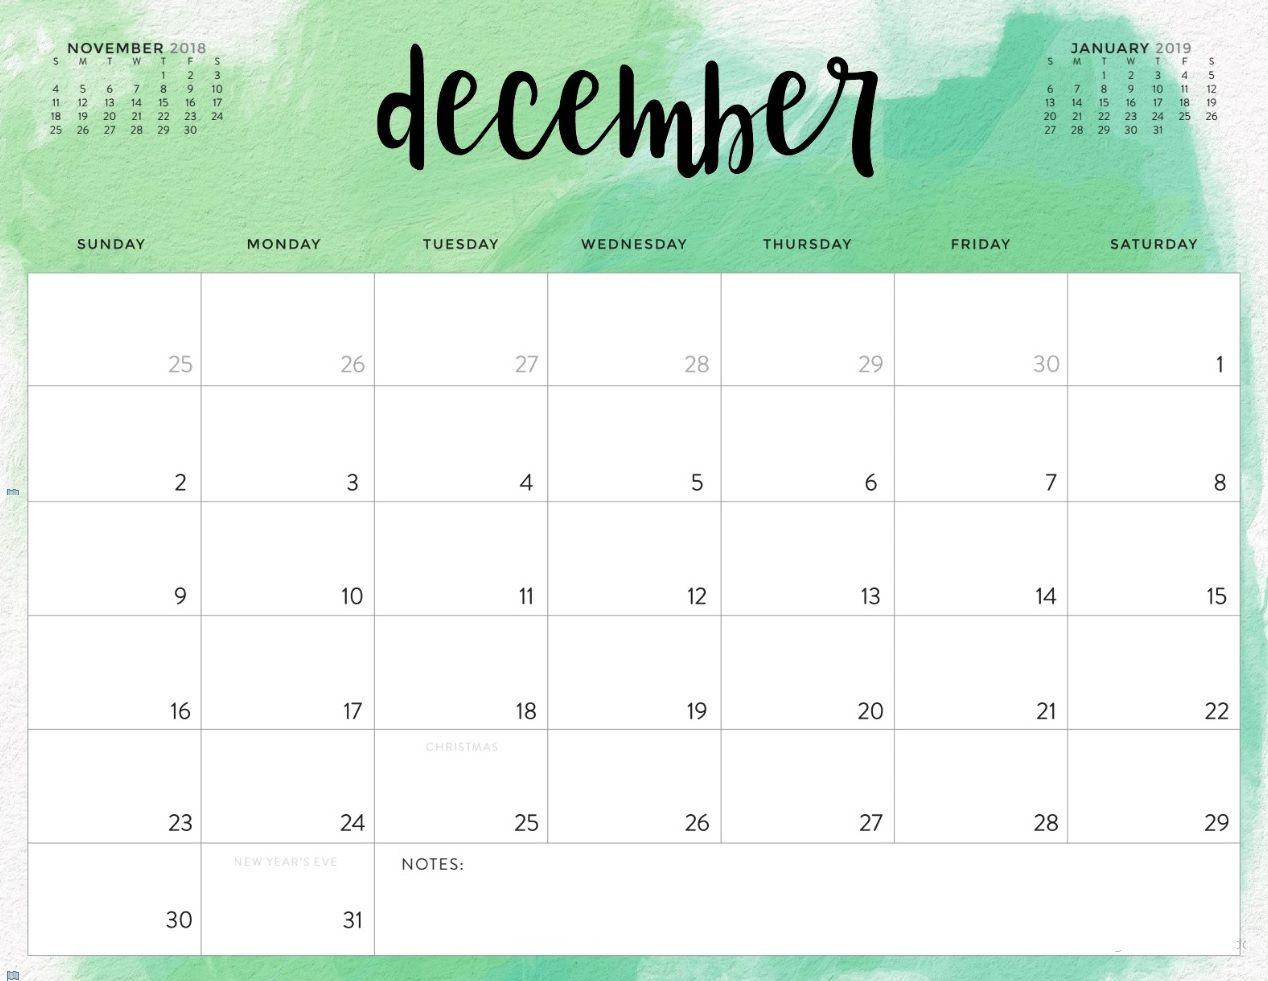 Free December 2018 Printable Calendar Blank Templates - Calendar in December Printable Monthly Calendar Templates